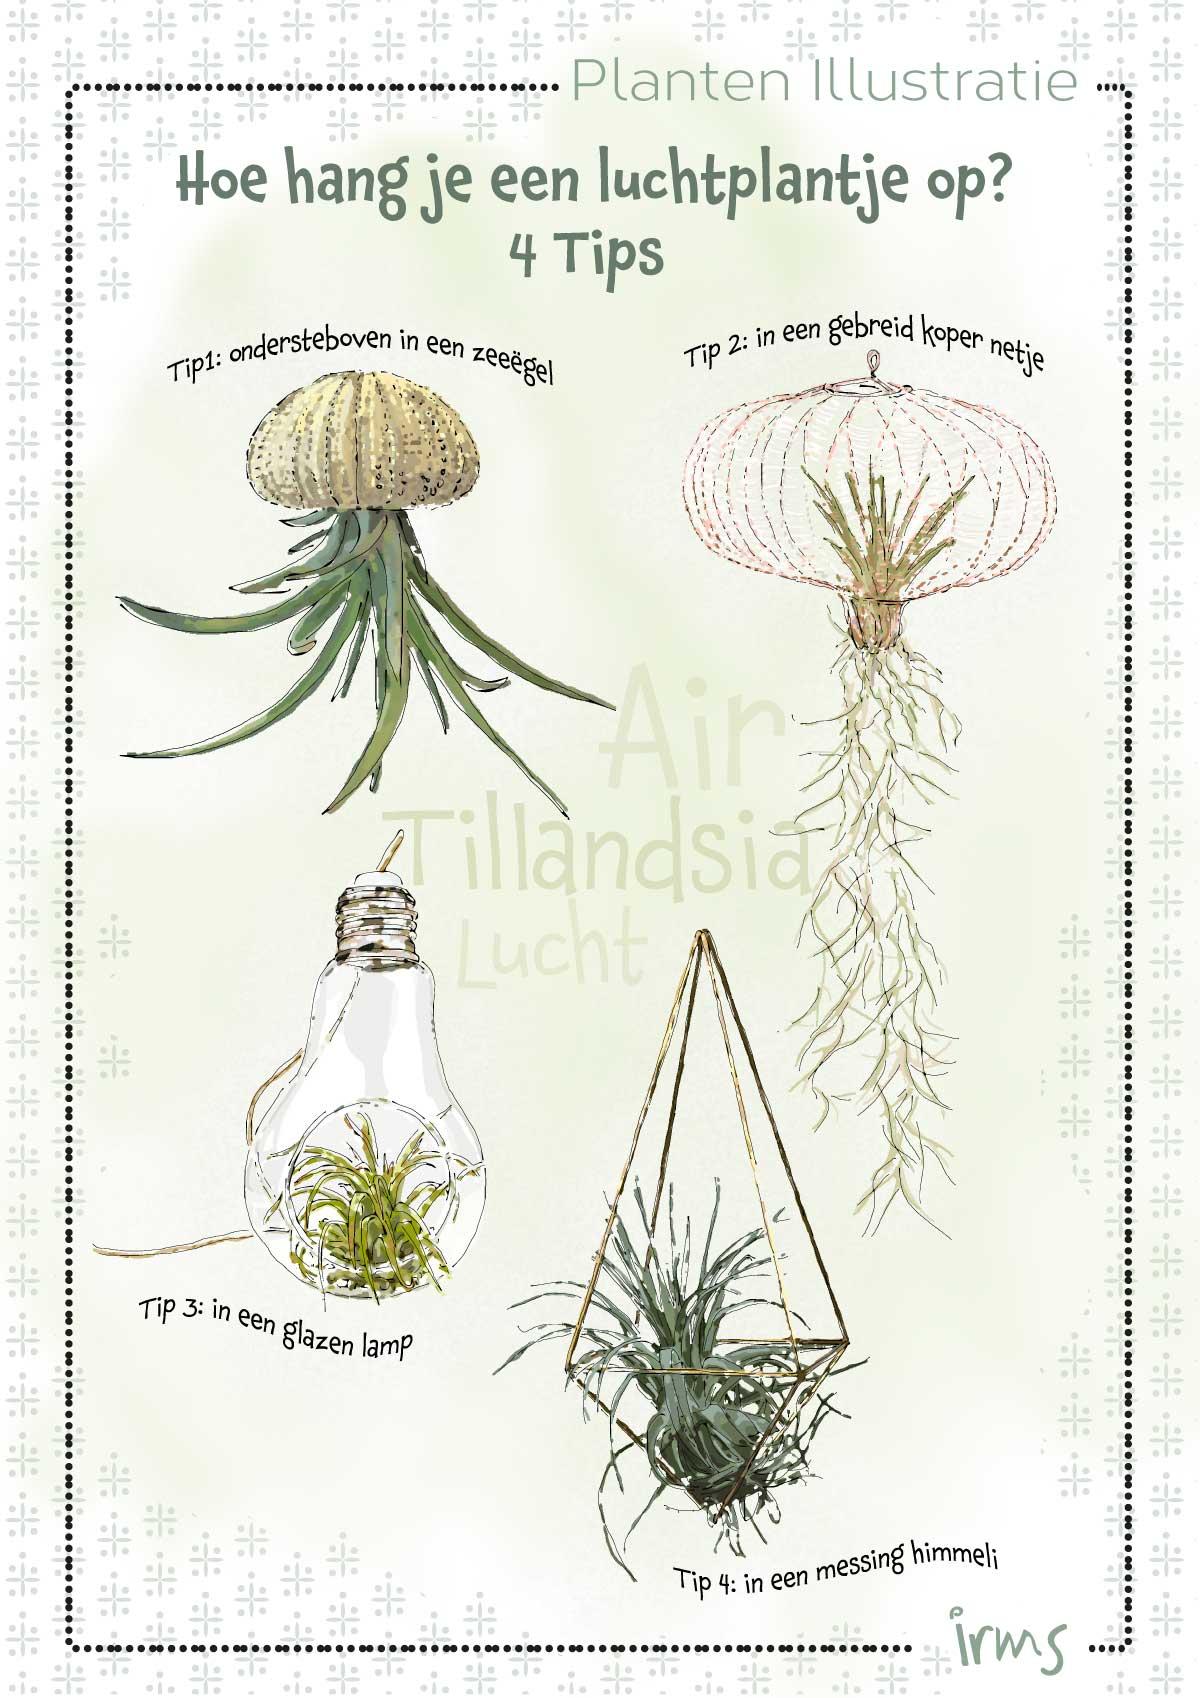 luchtplantjes-mini-poster-irmsblog